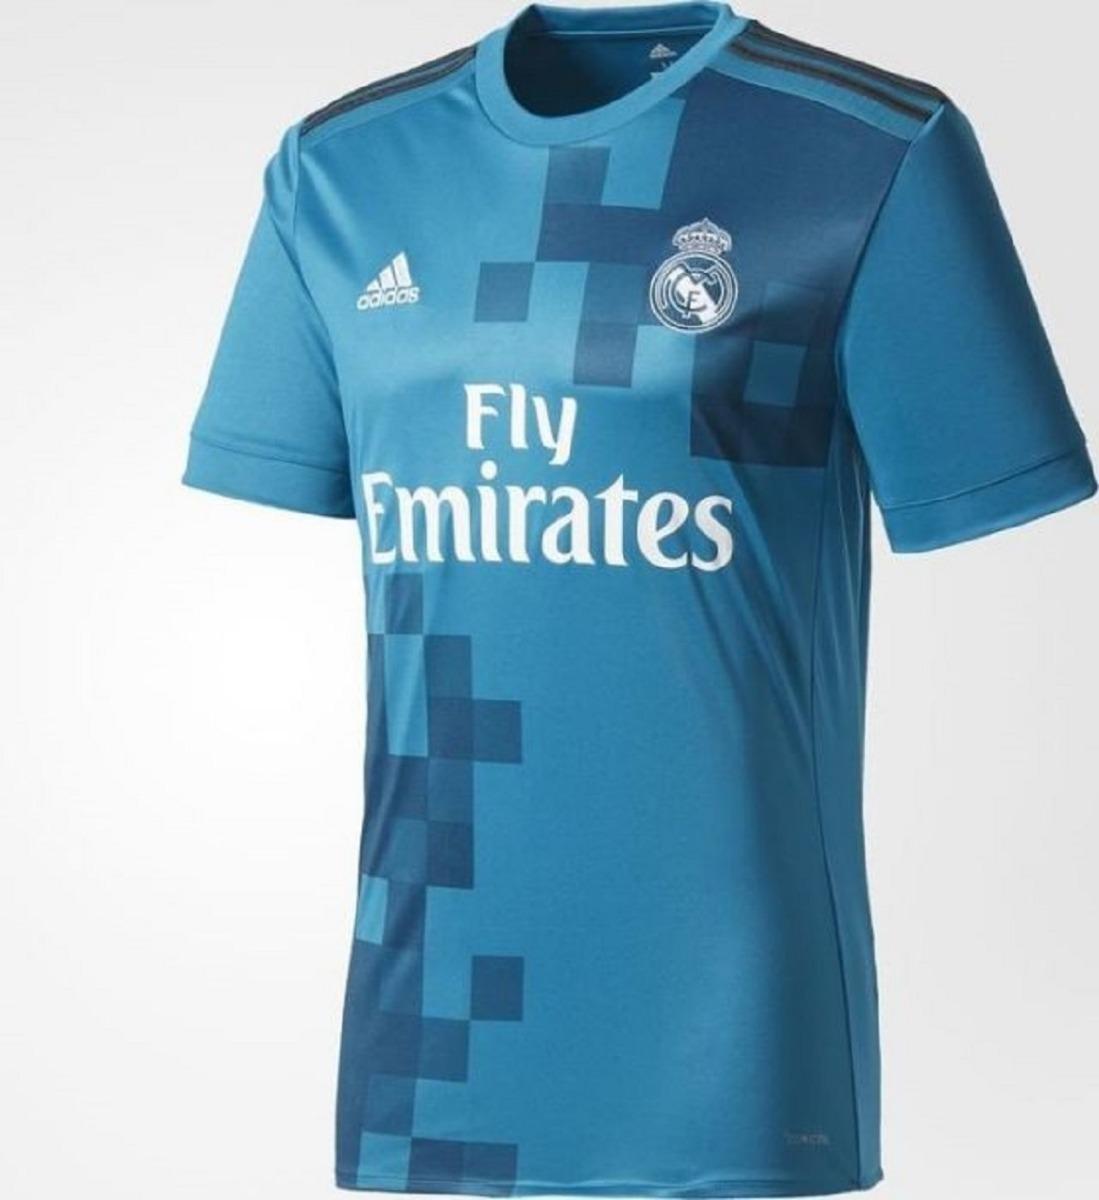 9c0c315d944a4 Jersey Tercer Uniforme Real Madrid 2018 adidas Nepa -   715.00 en ...